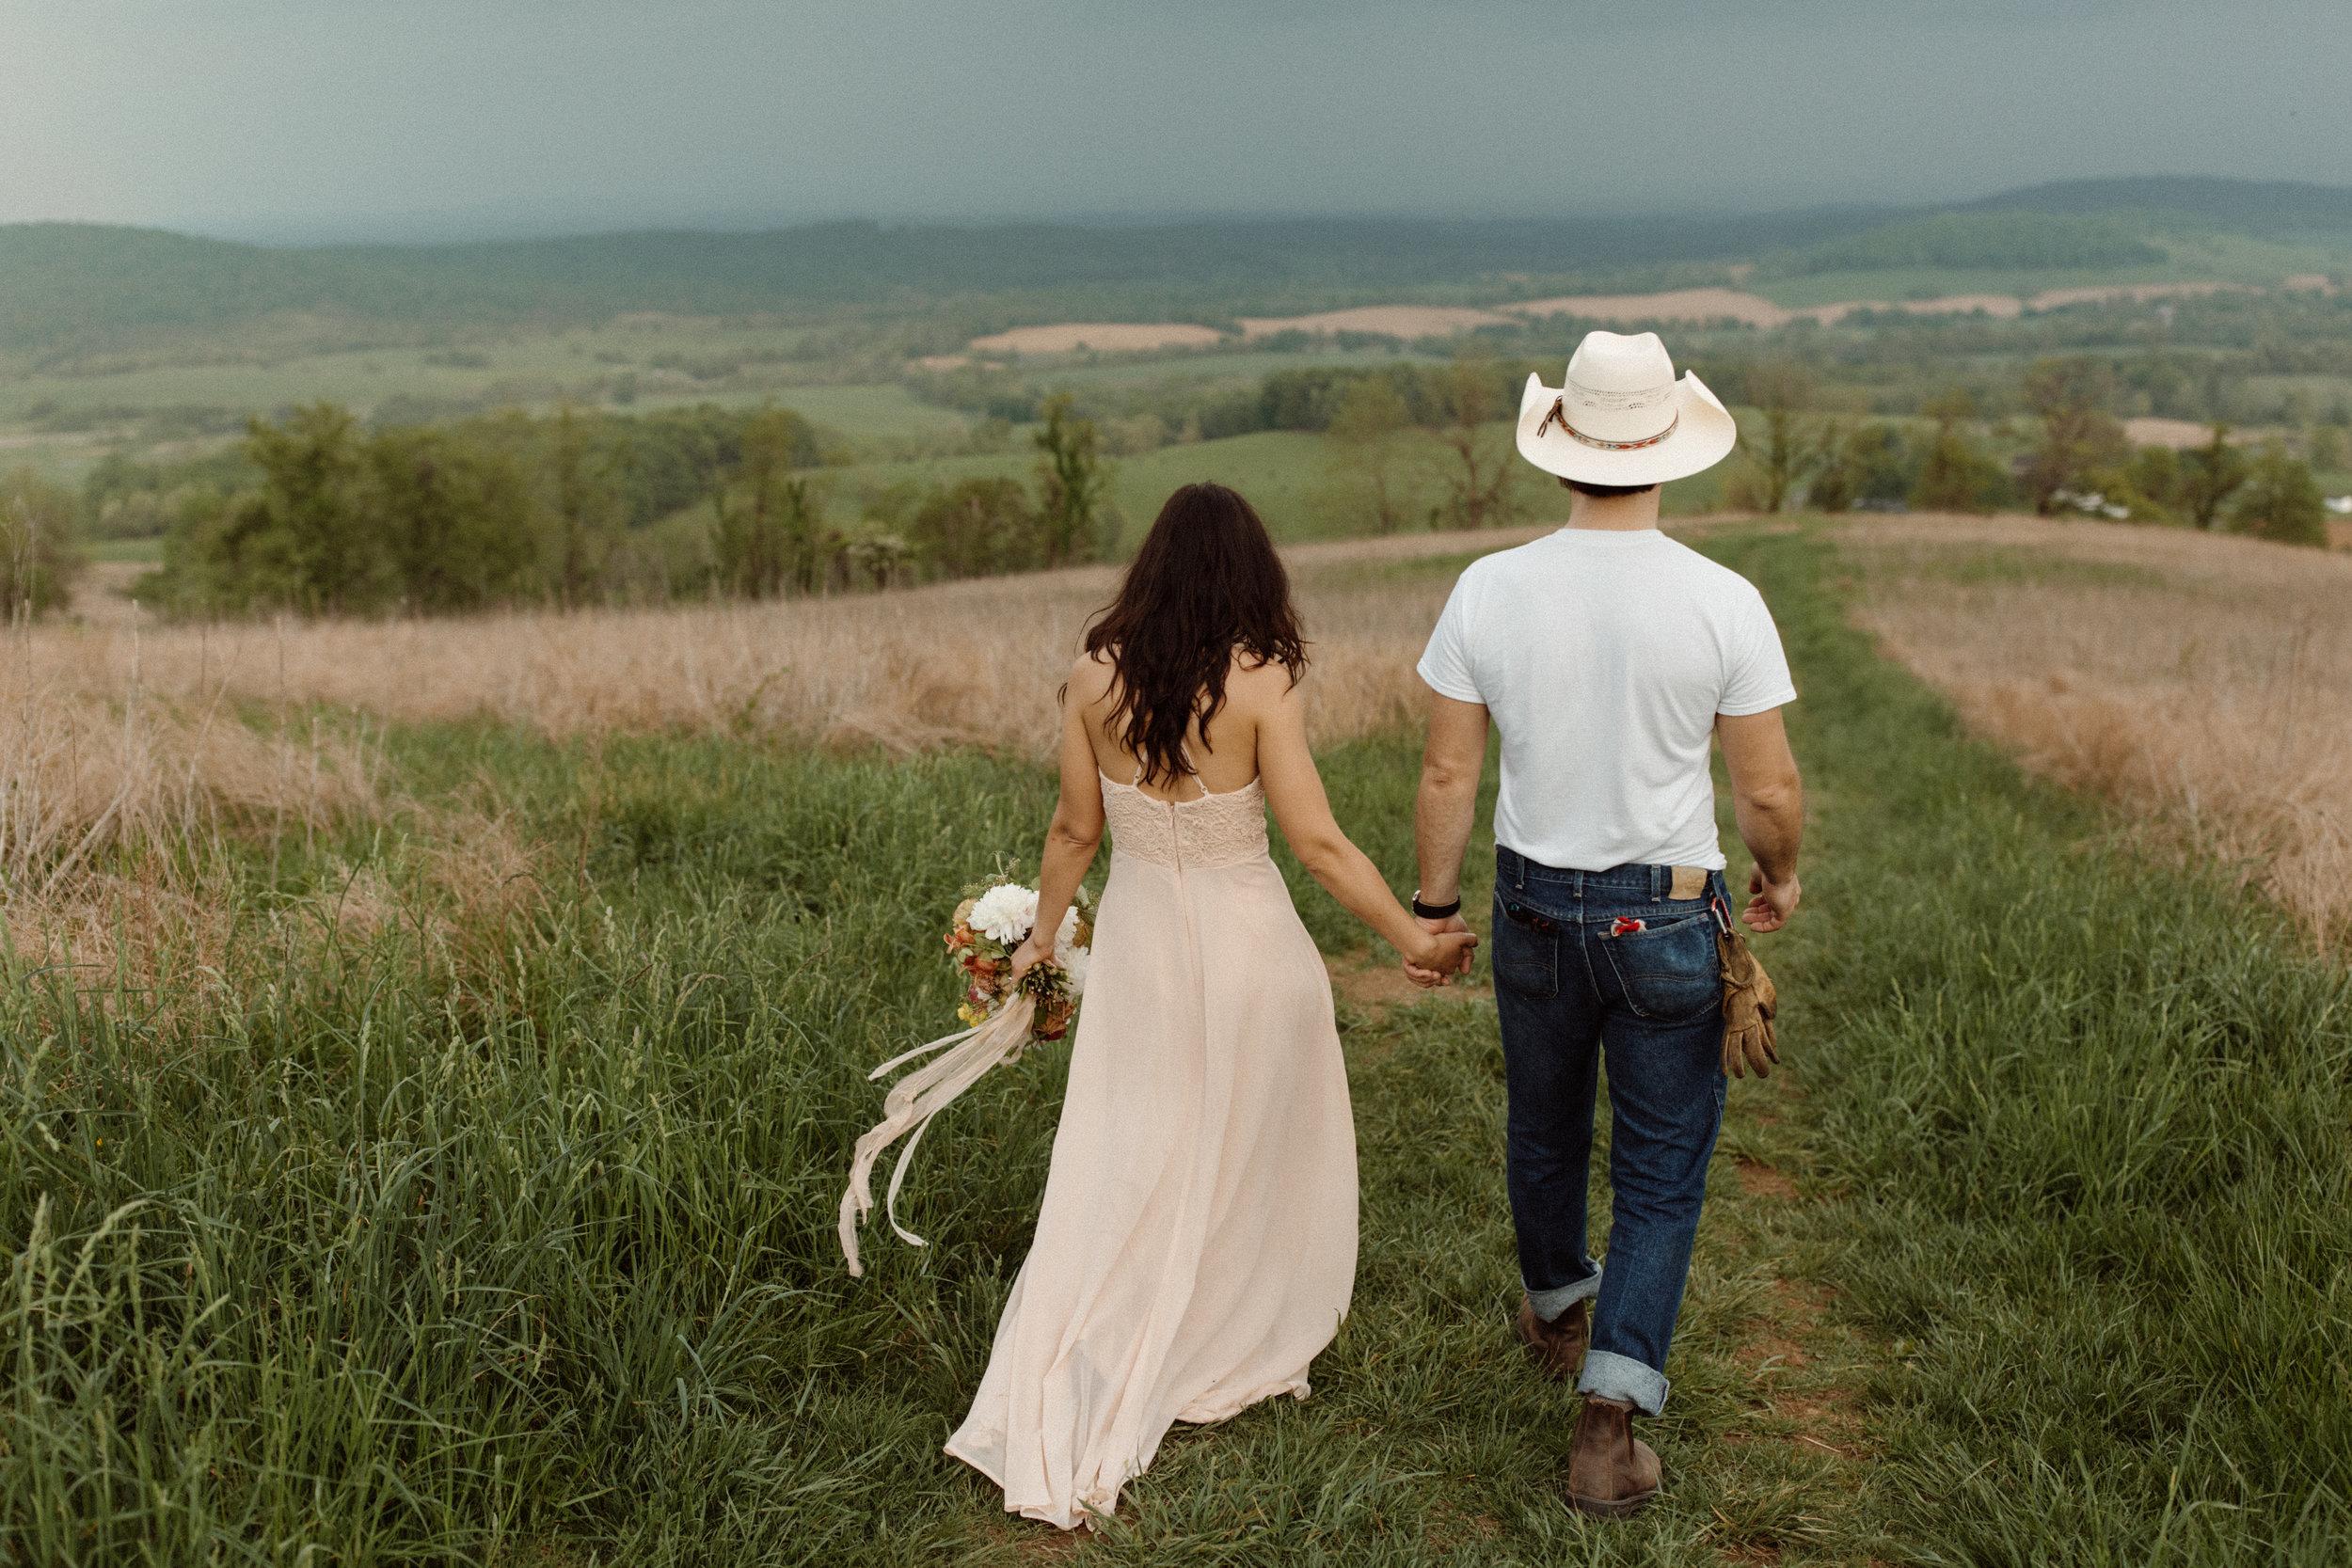 kelsey&mark-engagement-skymeadows-2019-peytoncurry-0059.jpg